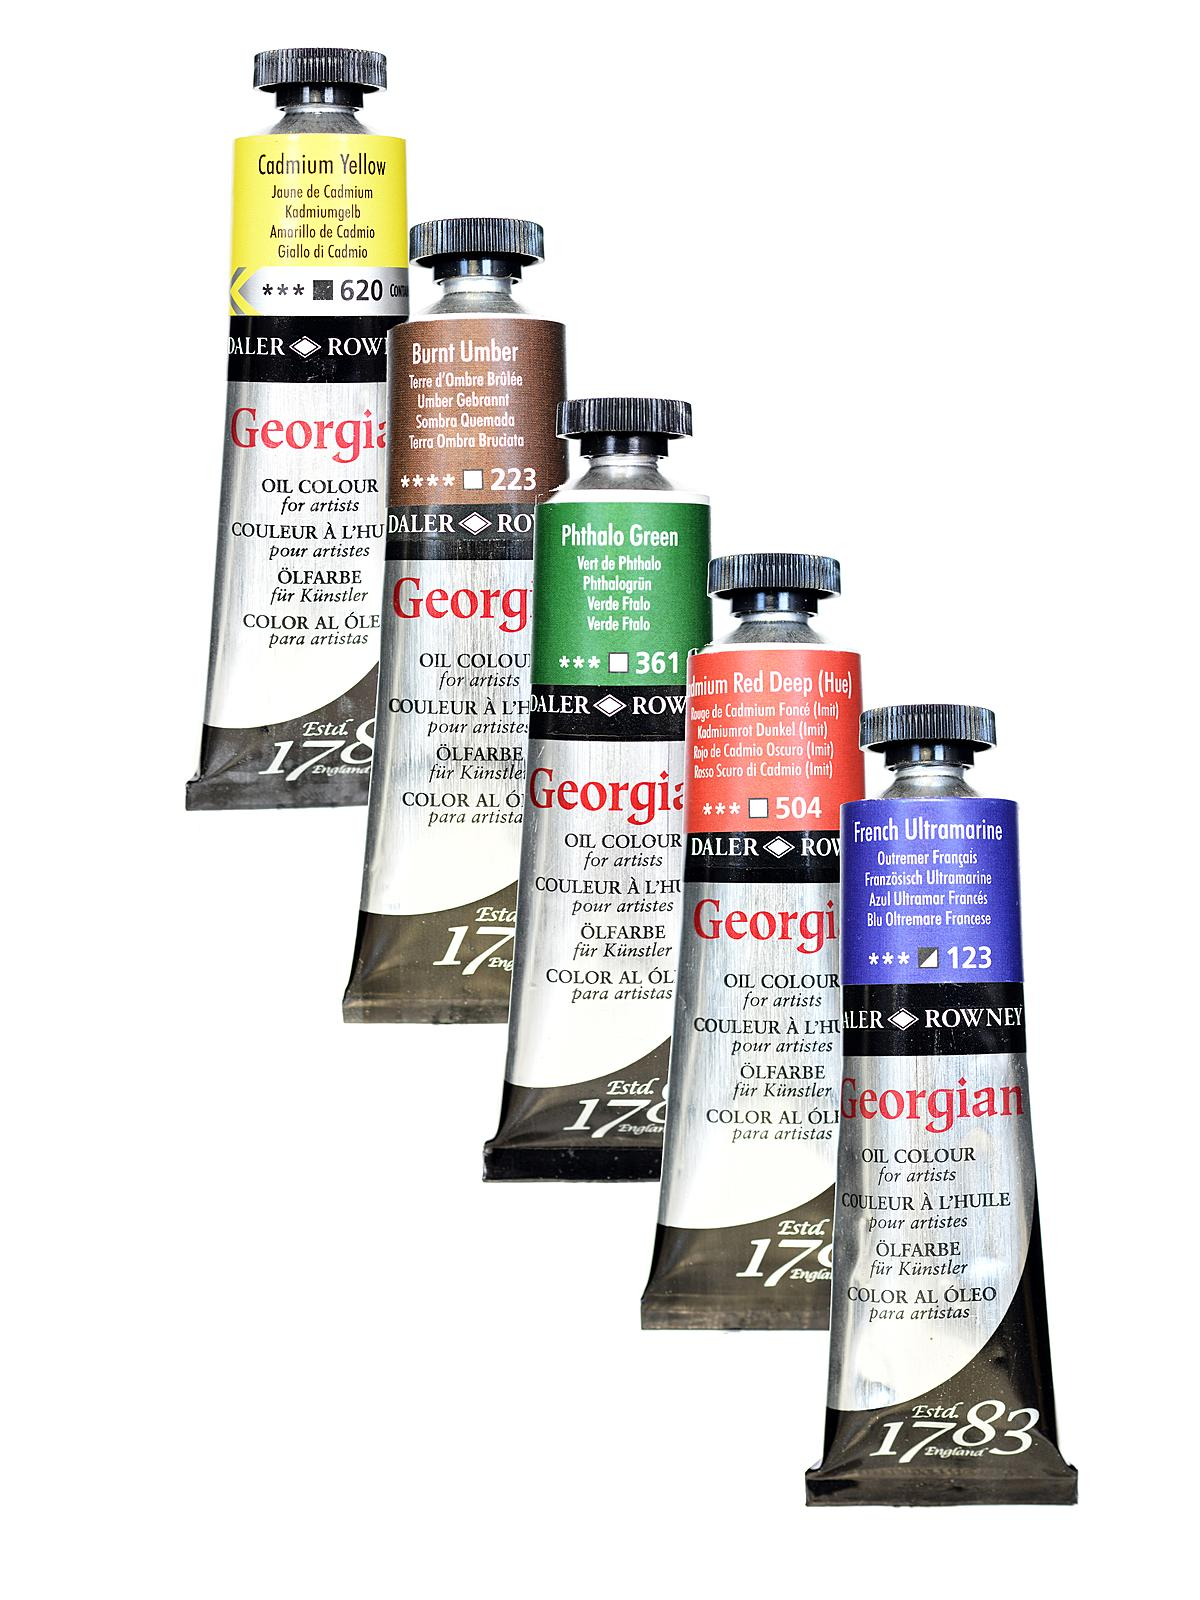 Daler-Rowney - Georgian Oil Colours